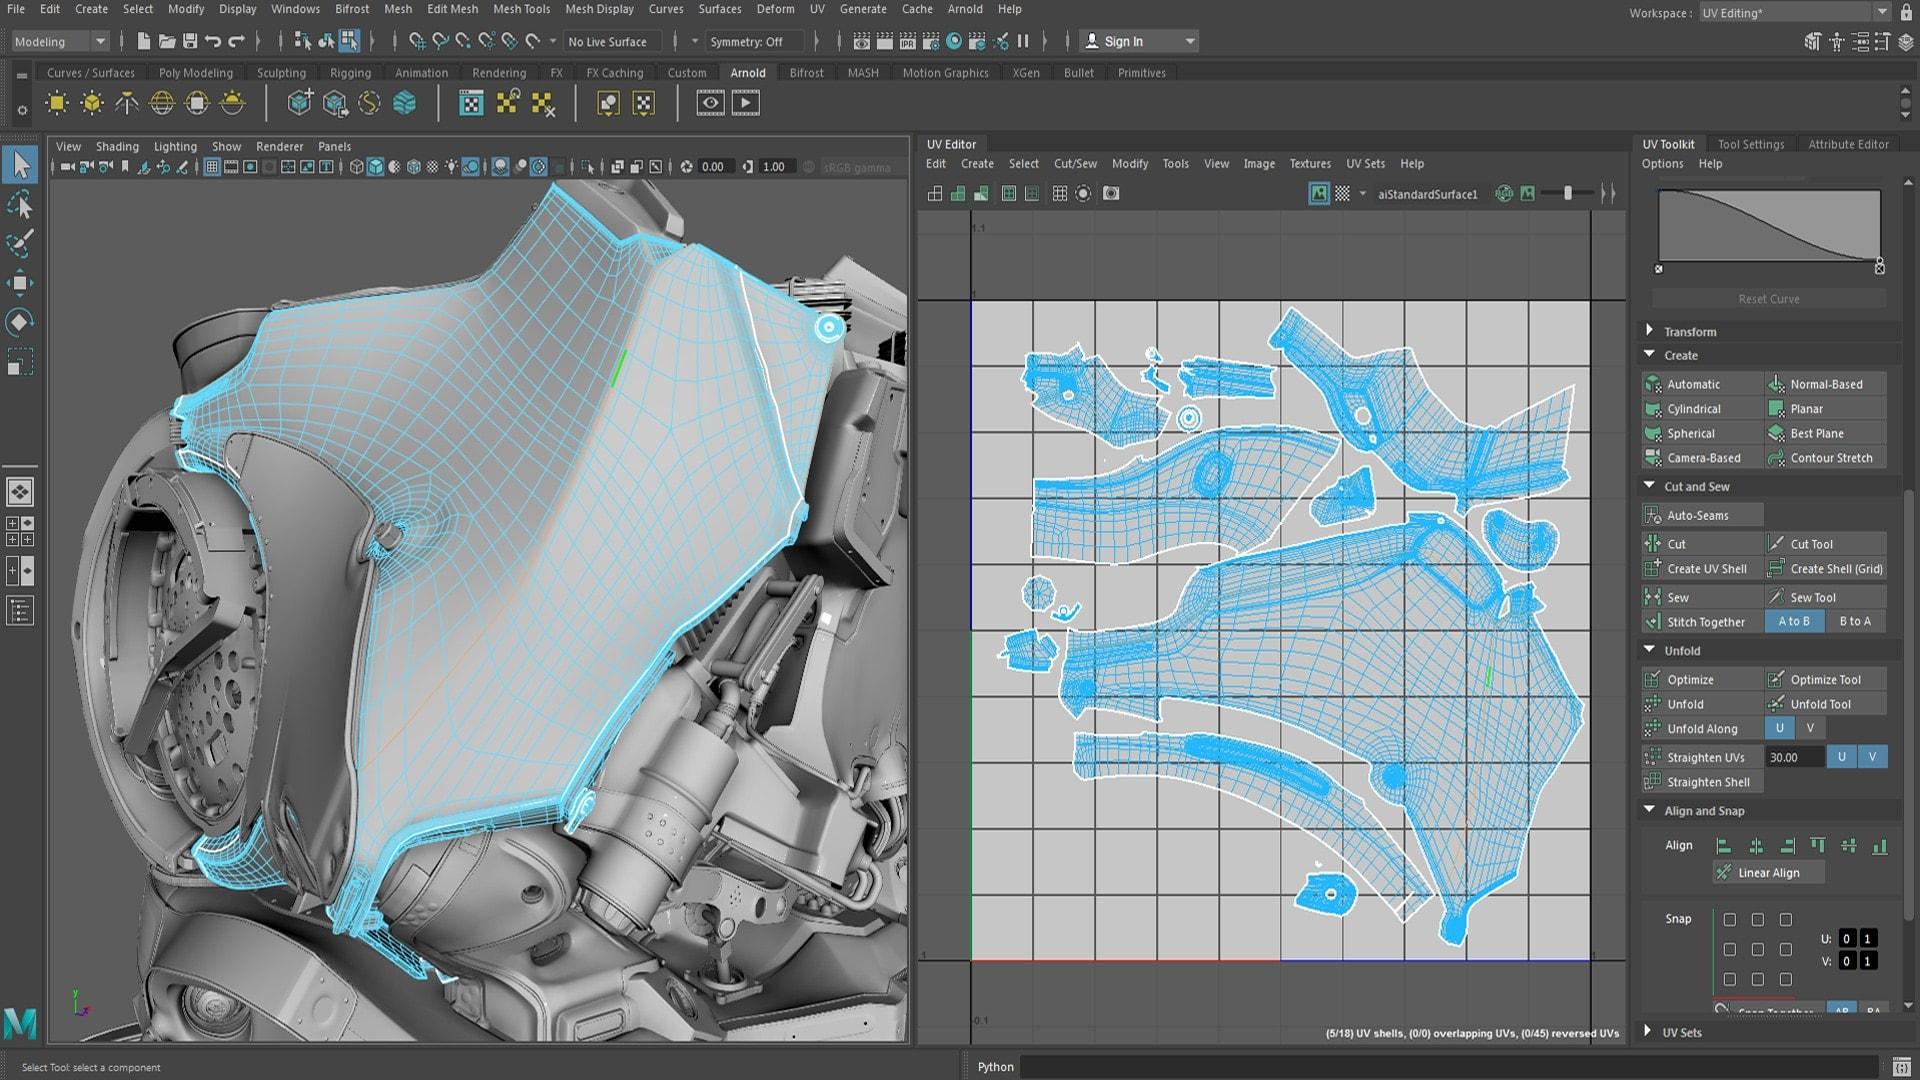 Maya | Computer Animation & Modeling Software | Autodesk